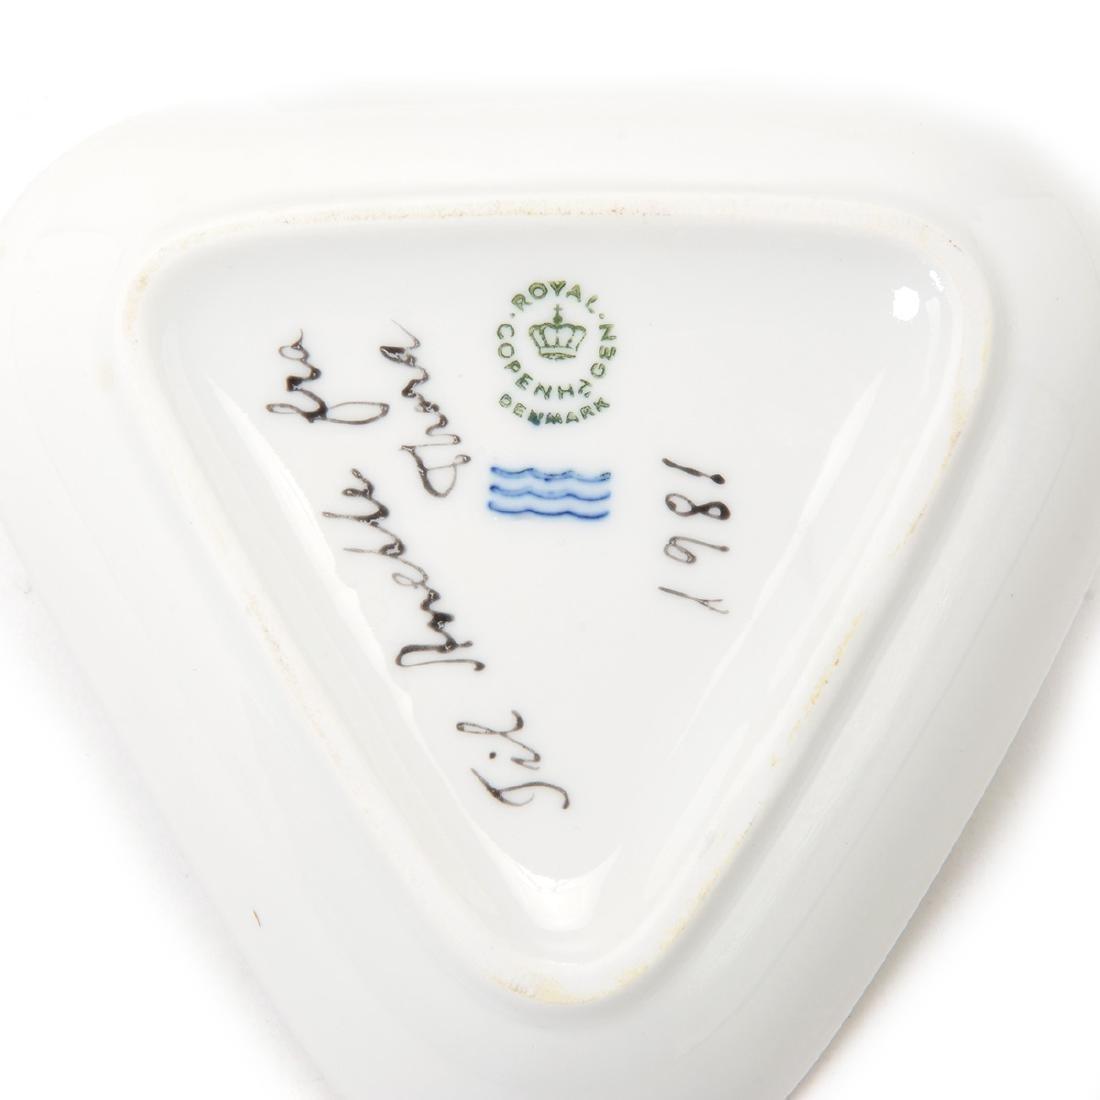 Royal Copenhagen Porcelain Serving and Table Articles - 9